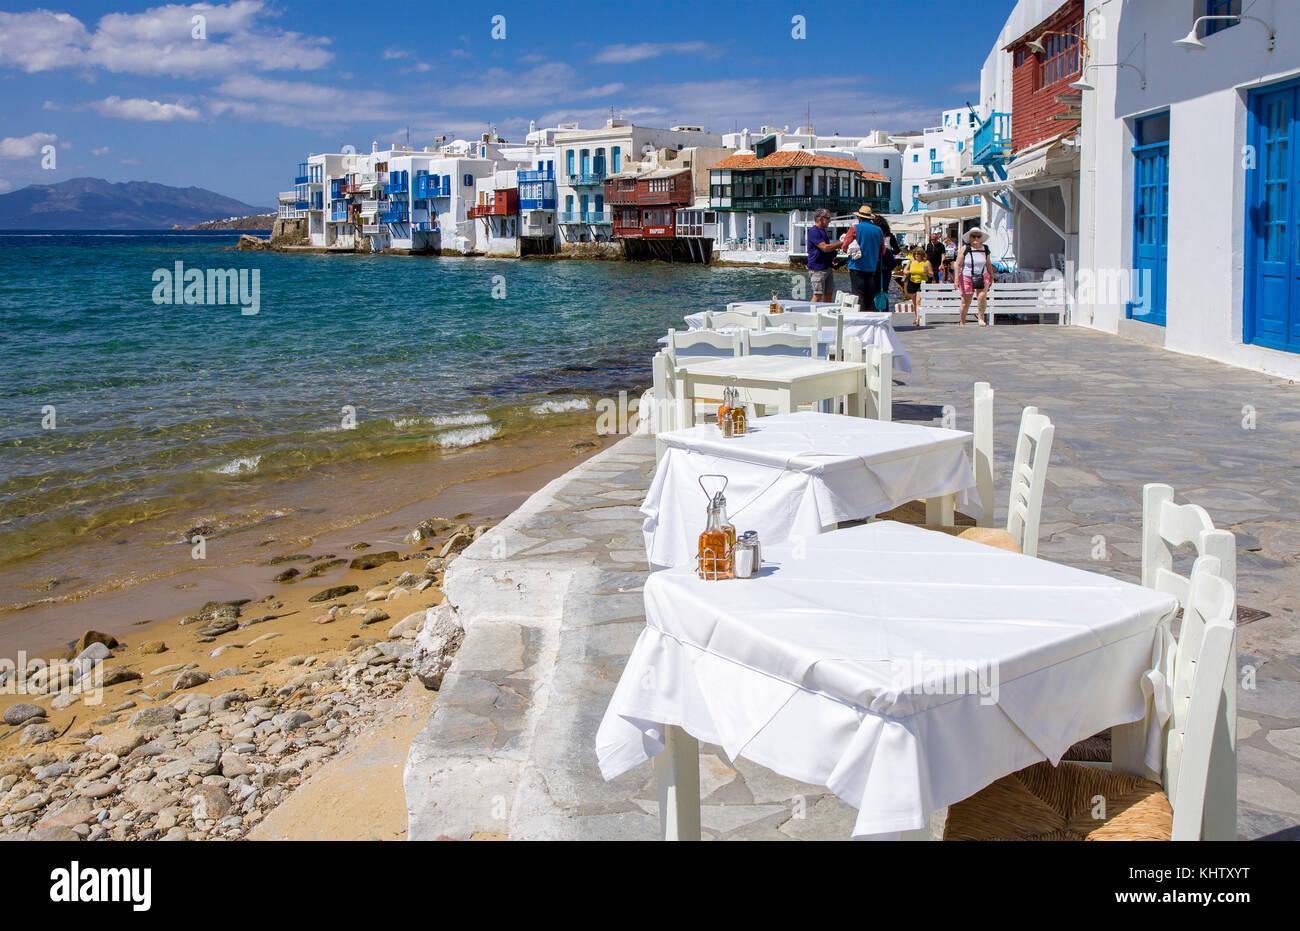 Gastronomie in Klein Venedig in Mykonos-Stadt, gastronomy at Little Venice at Mykonos-town, Mykonos island, Cyclades, - Stock Image